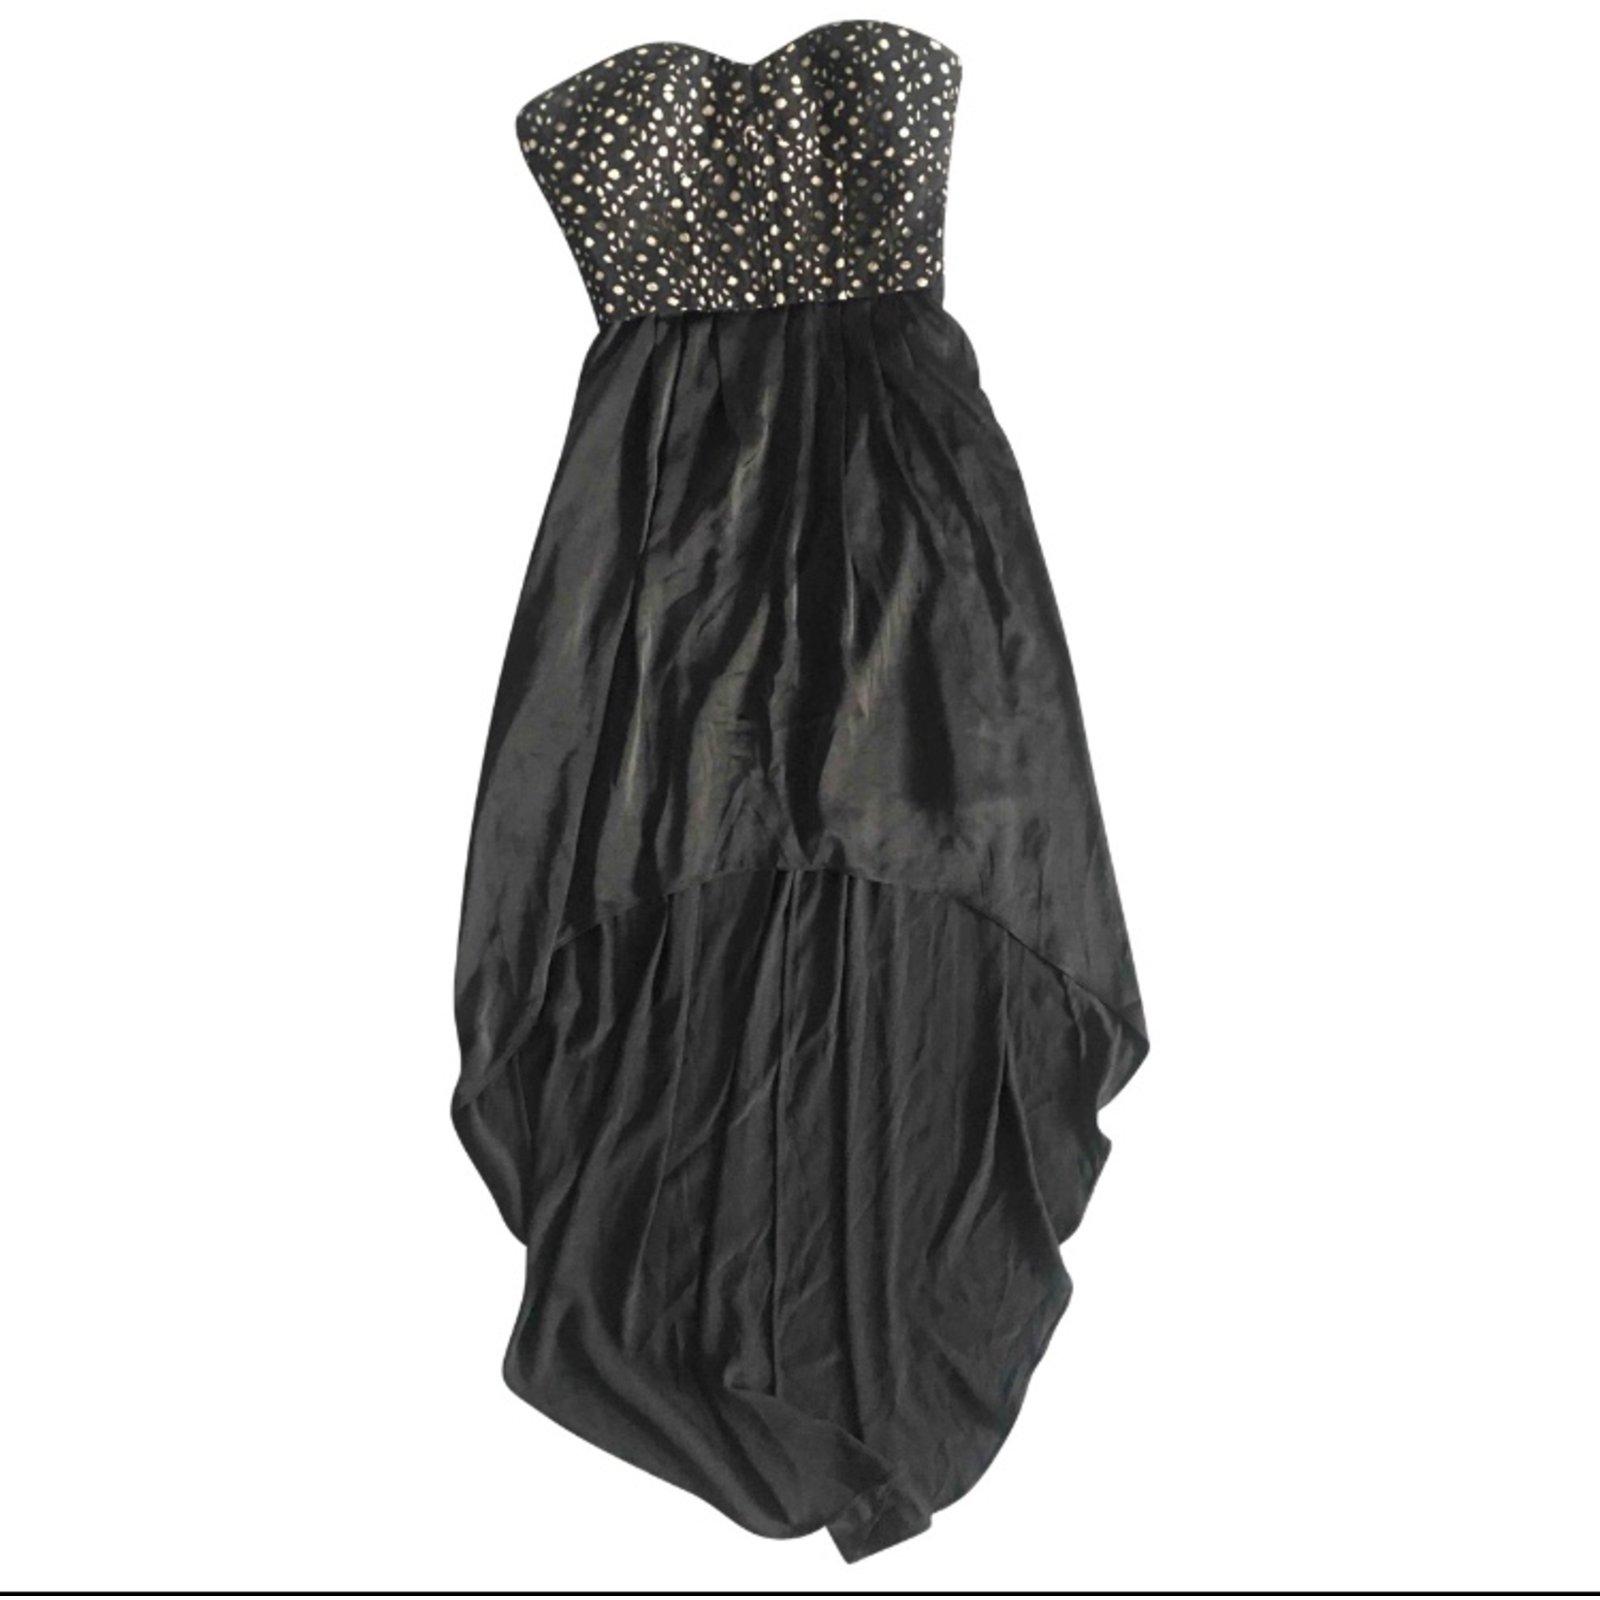 Bcbg Max Azria Strapless Black Dress with a Train Dresses Silk Black ...